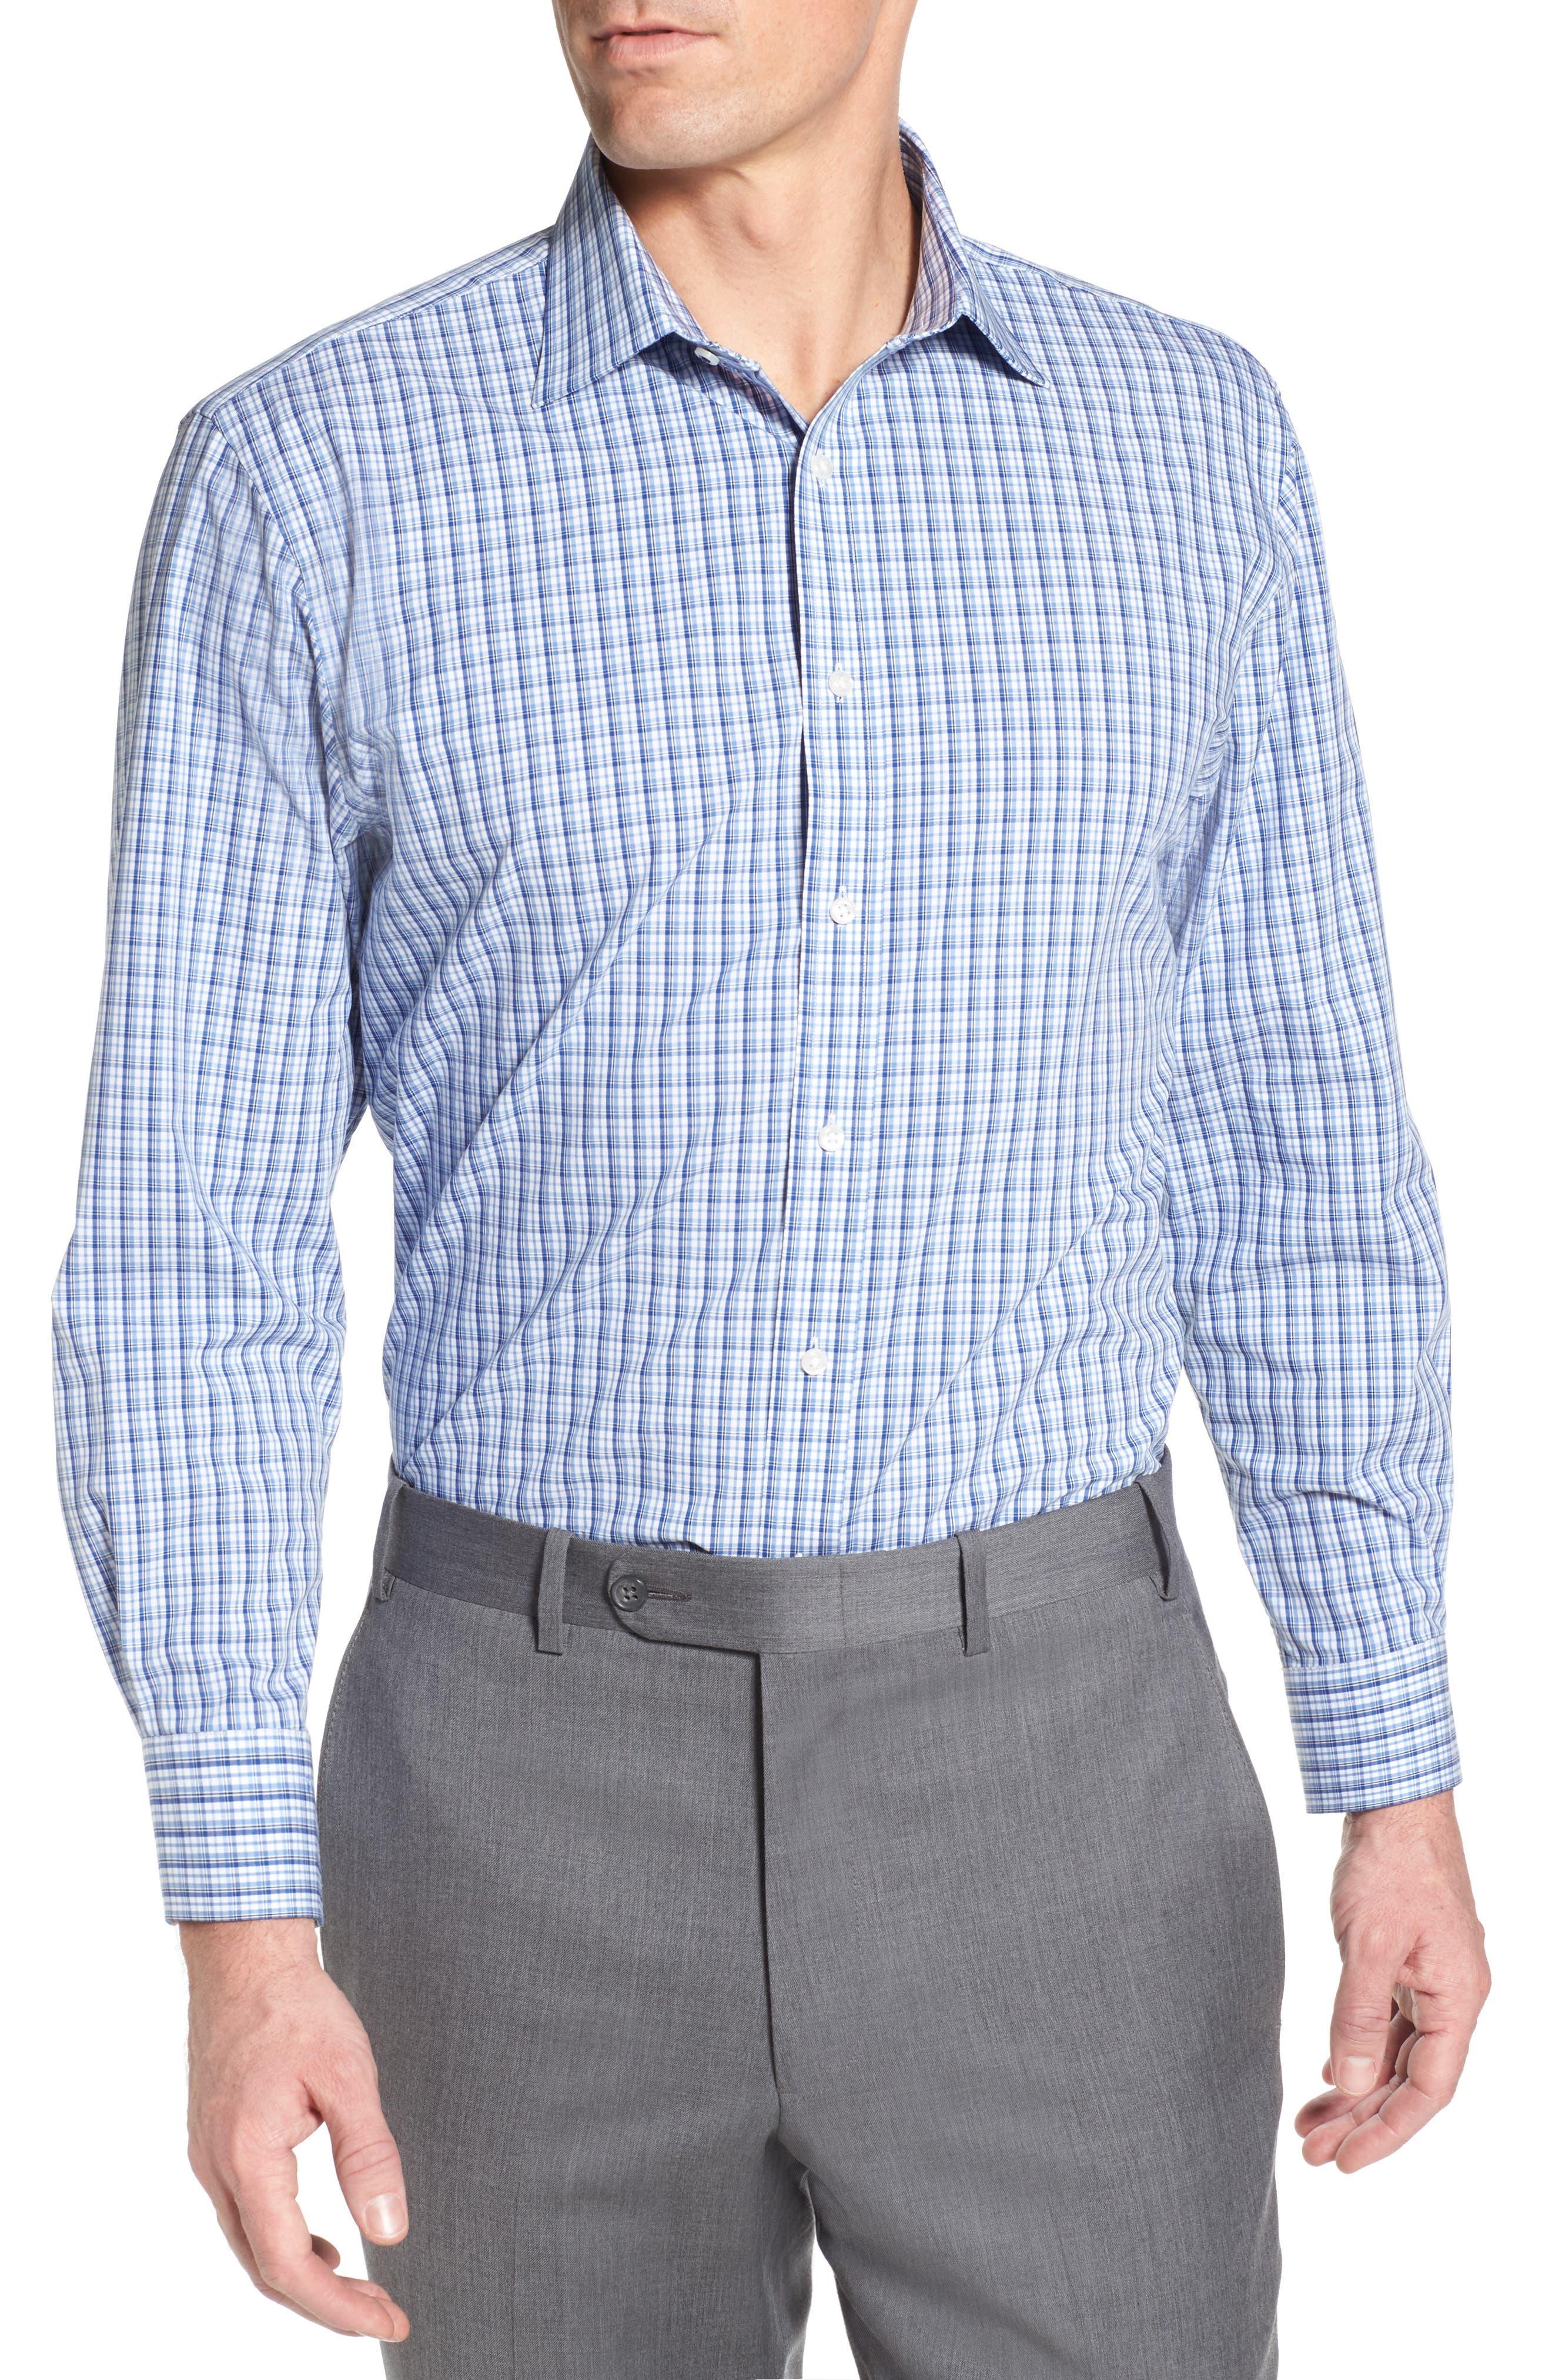 Nordstrom Men's Shop Tech-Smart Traditional Fit Stretch Plaid Dress Shirt